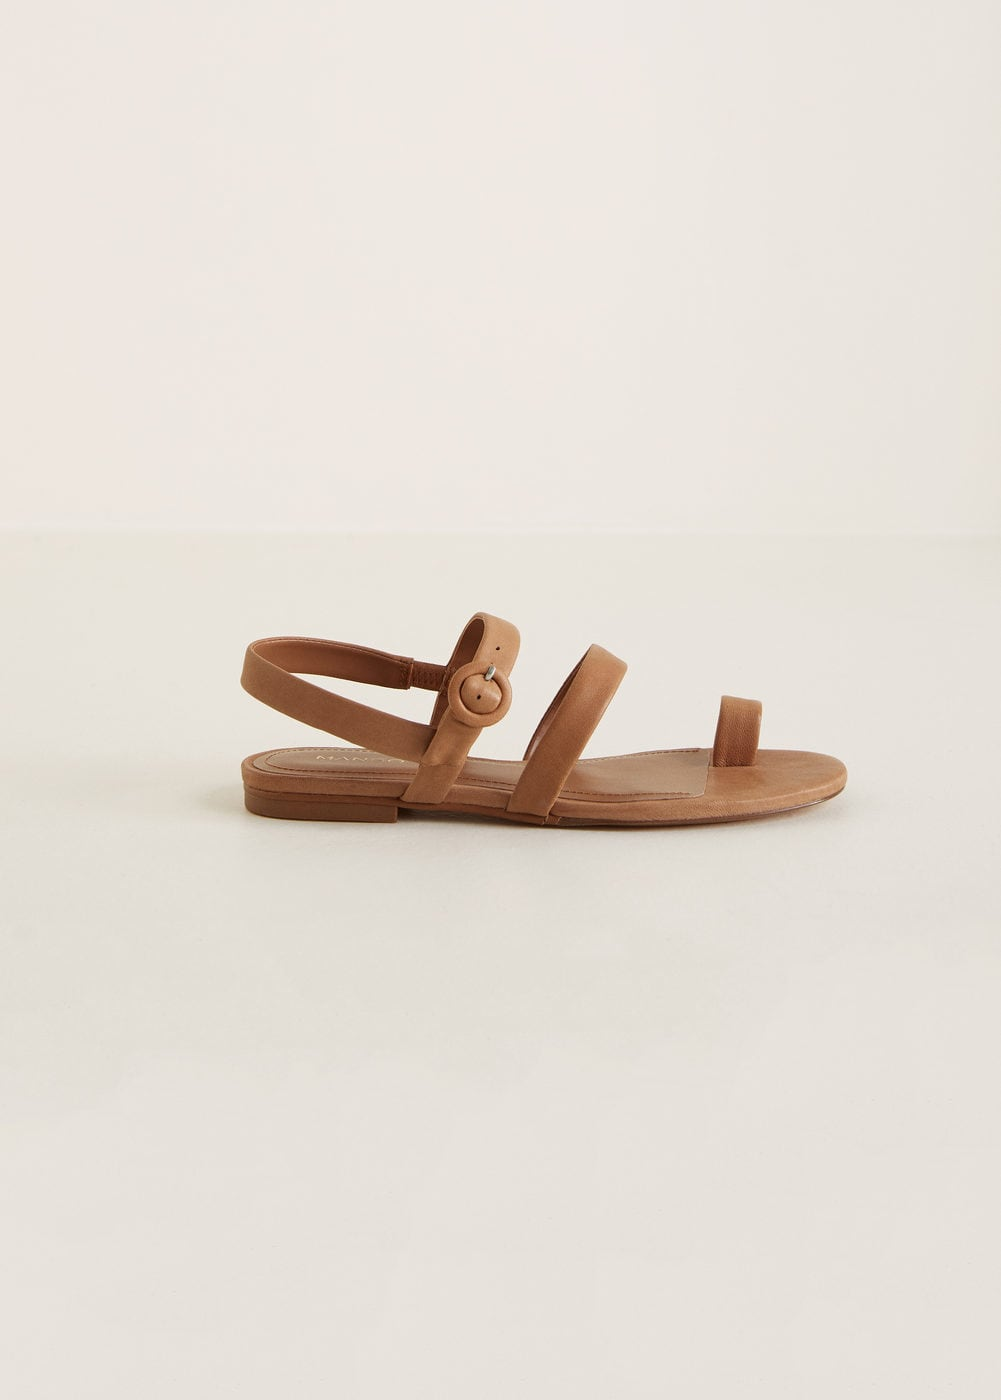 Tiras Zapatos MujerMango España Piel De Sandalia bm7gfIY6yv